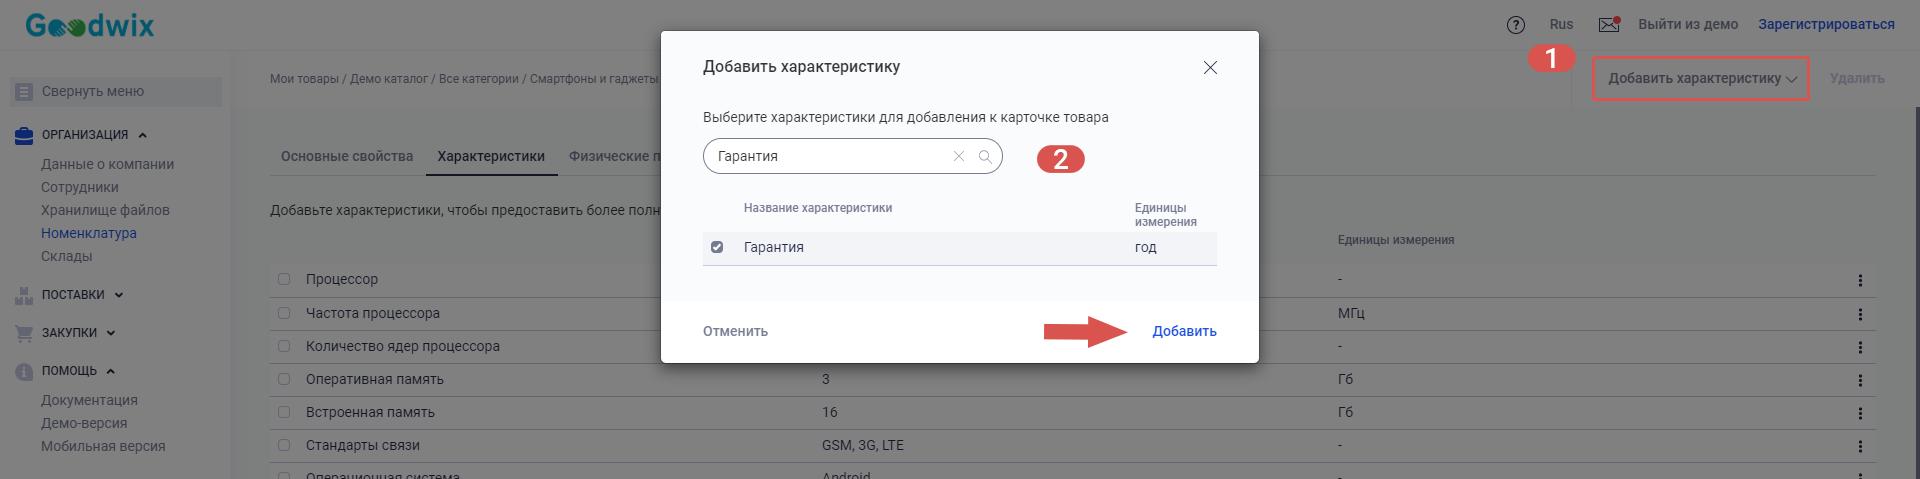 Поиск характеристики товара_Руководство по работе с каталогом